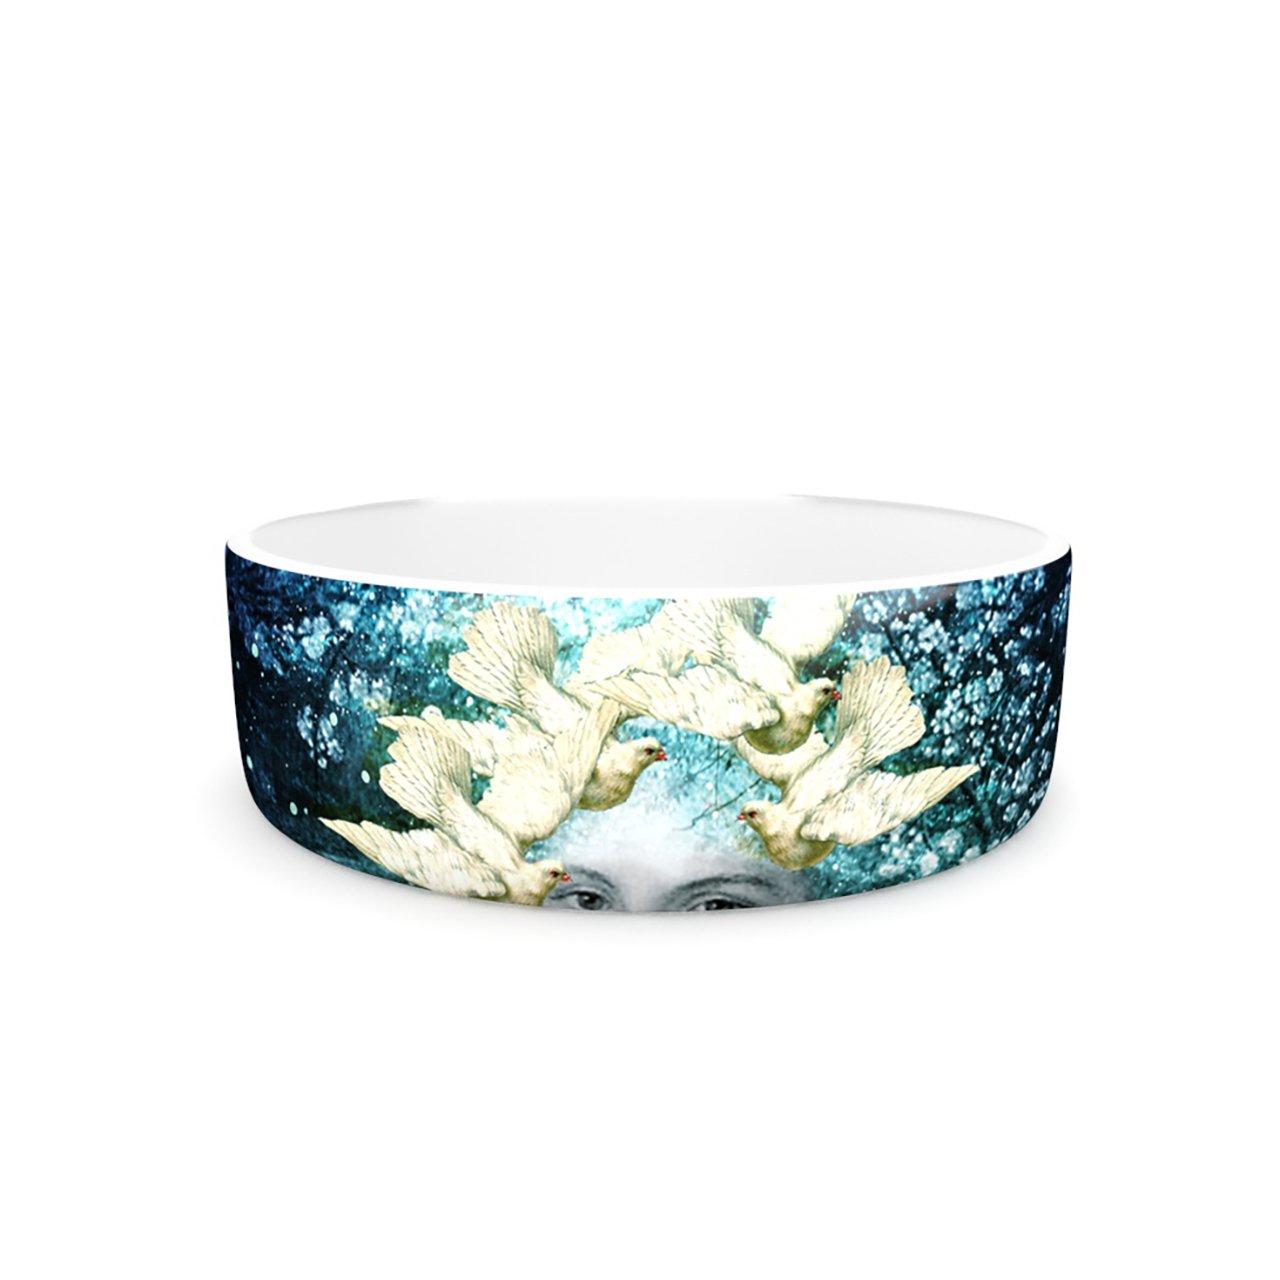 Kess InHouse Suzanne Carter Adorned  Pet Bowl, 7-Inch, bluee